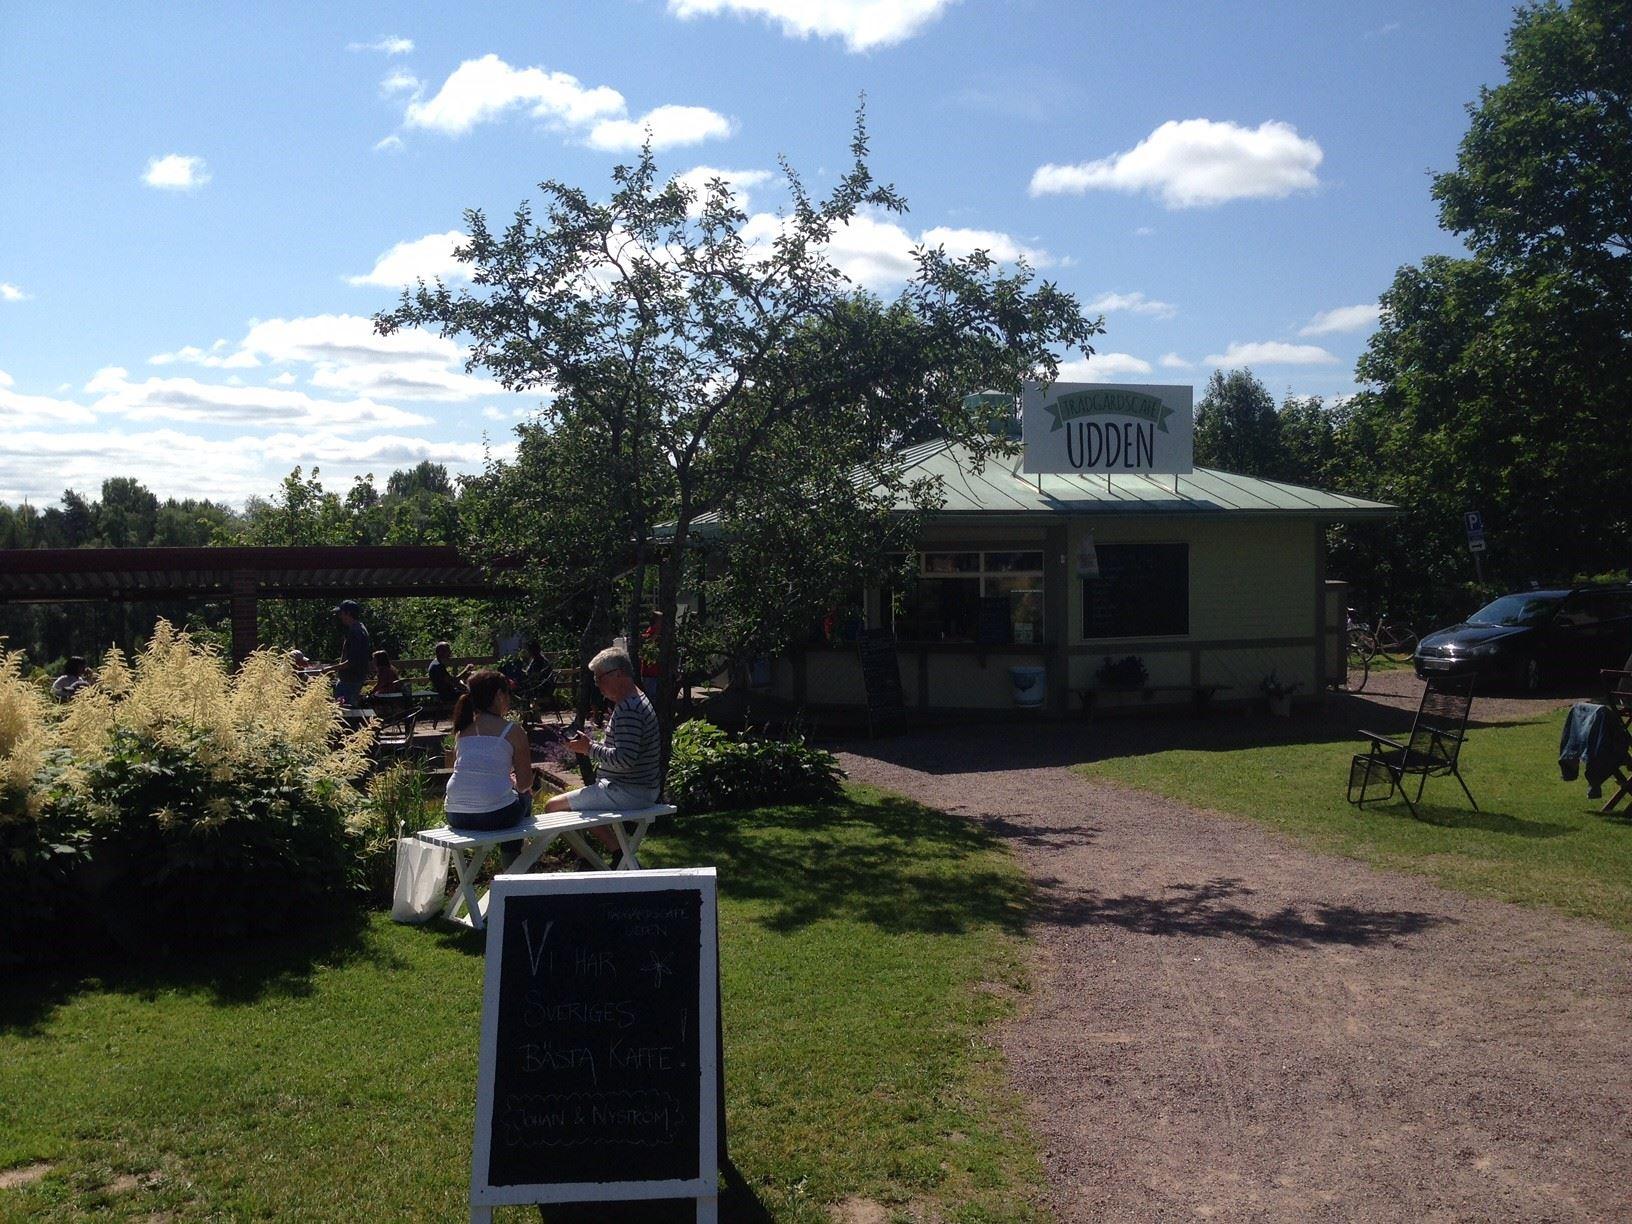 Trädgårdscafé Udden